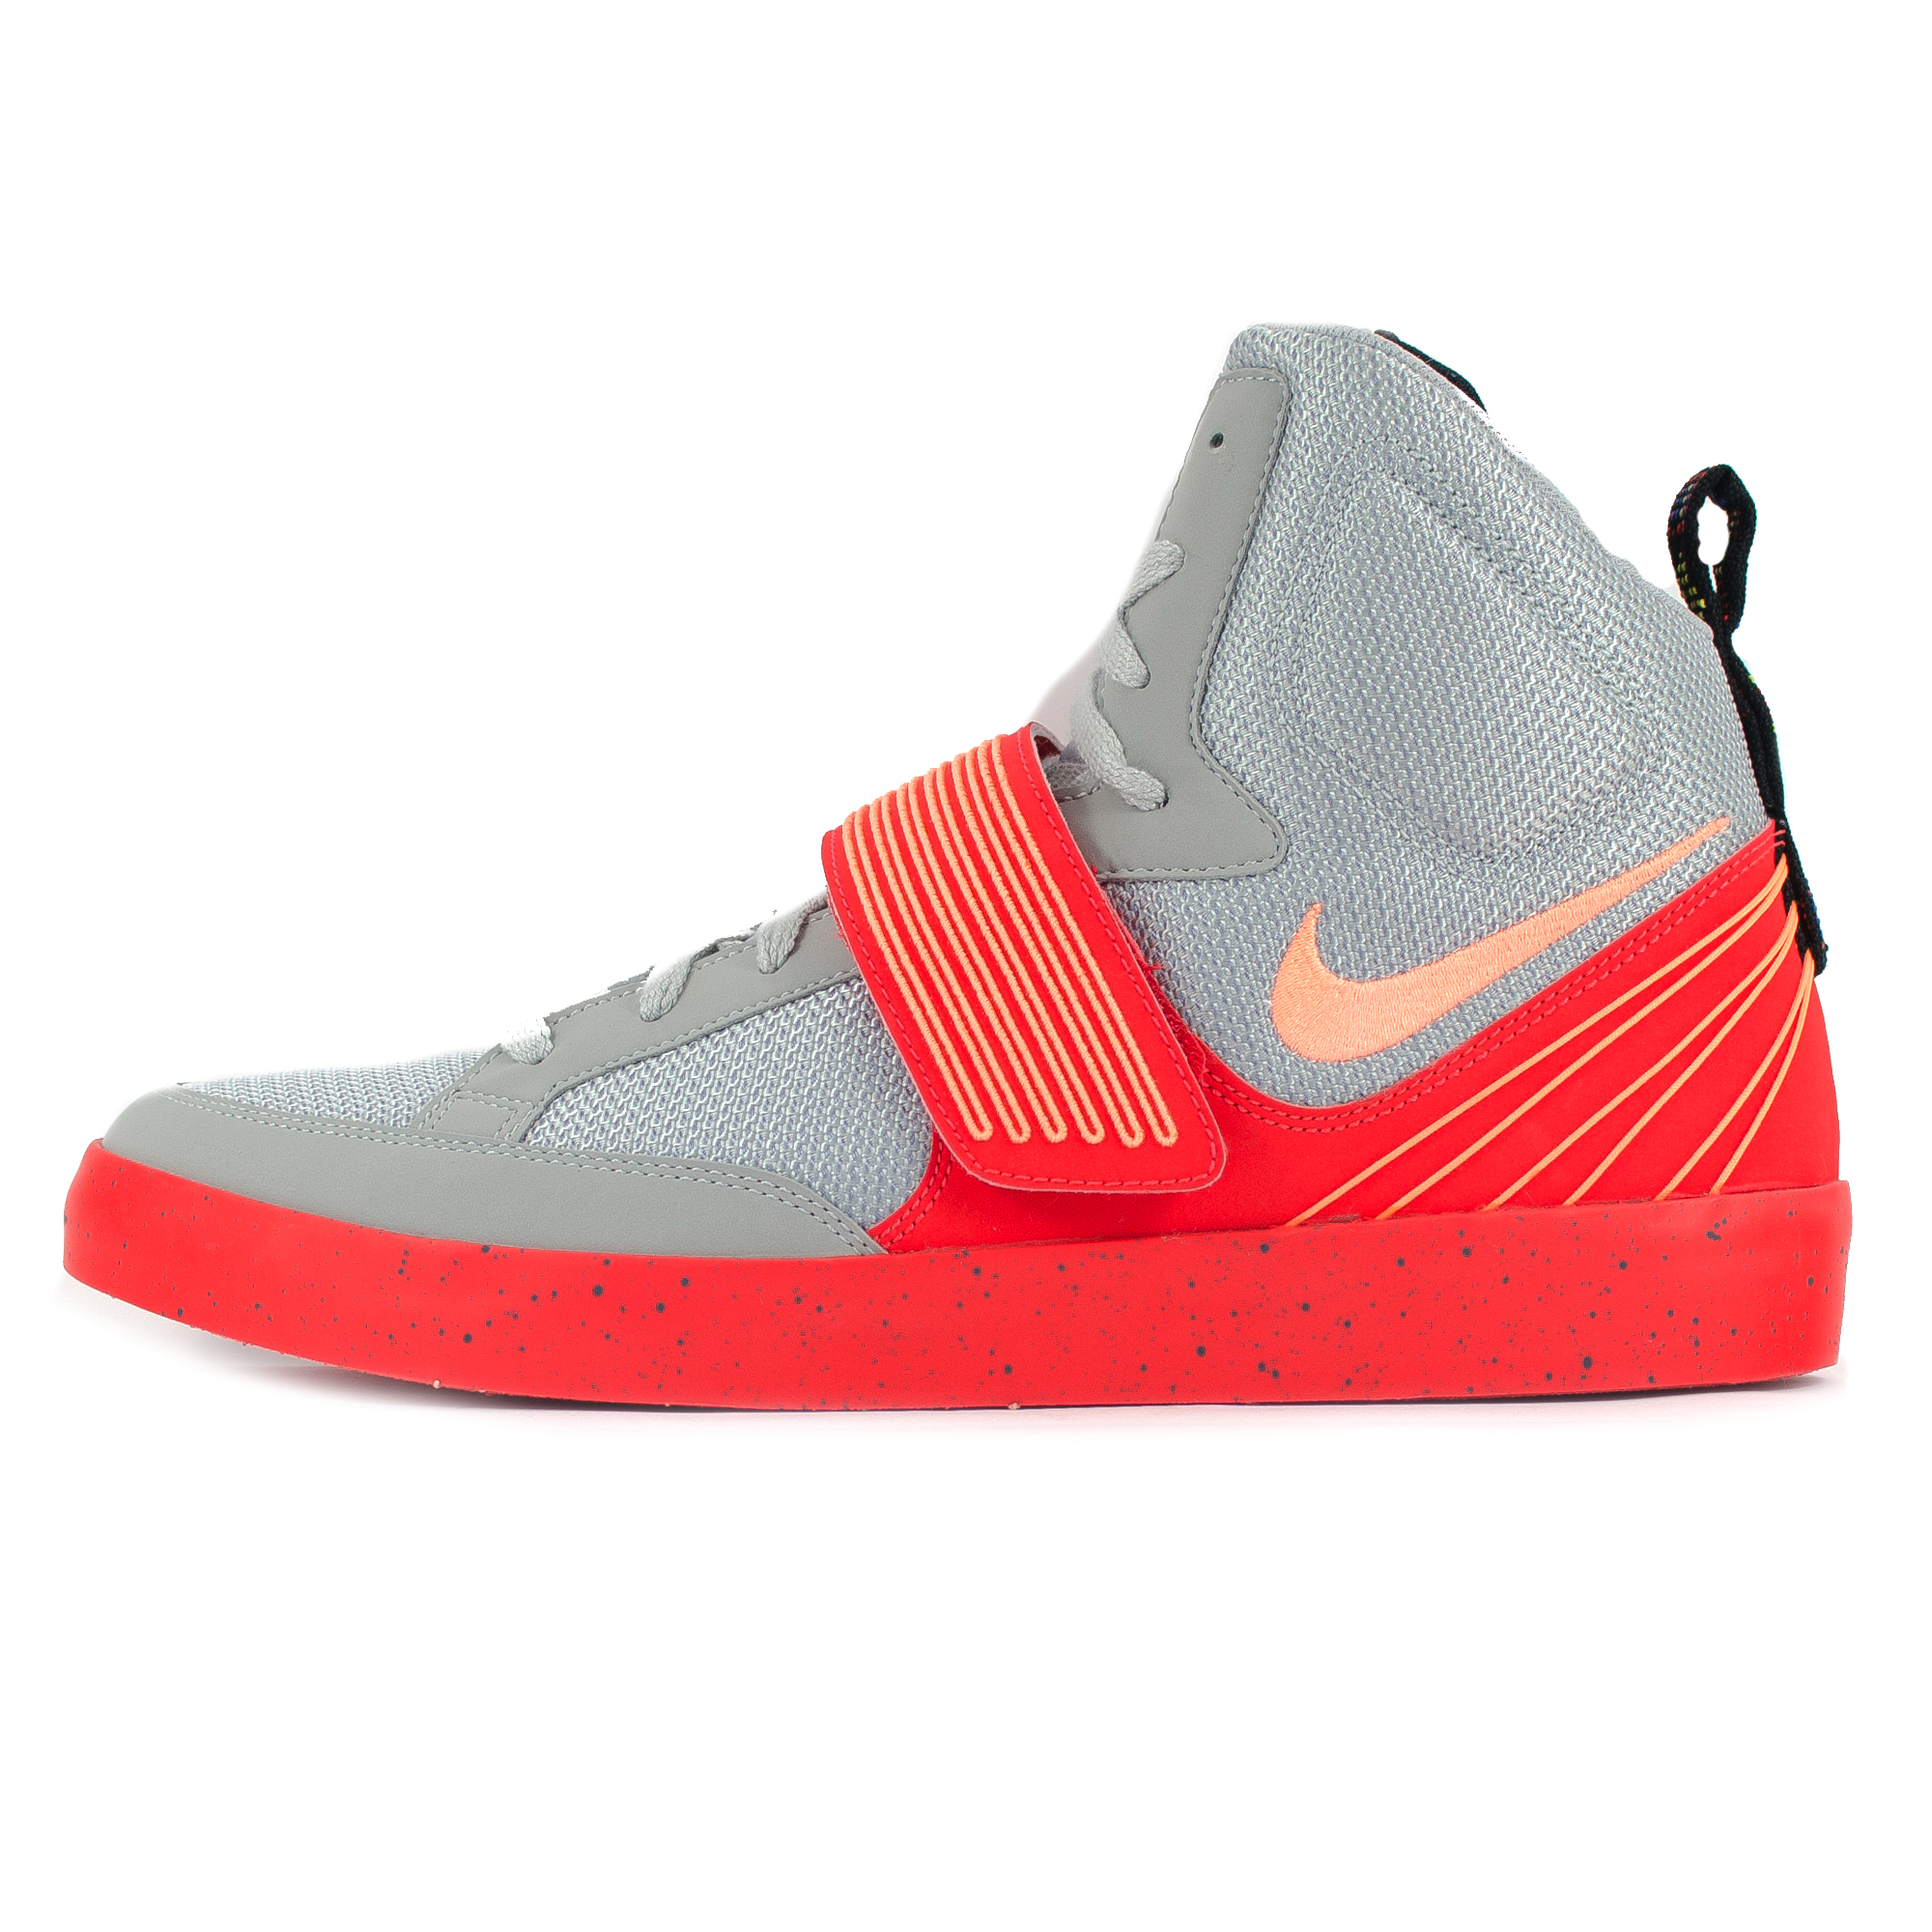 Nike NSW Skystepper High Top Grey/Atomic Orange Velcro ...